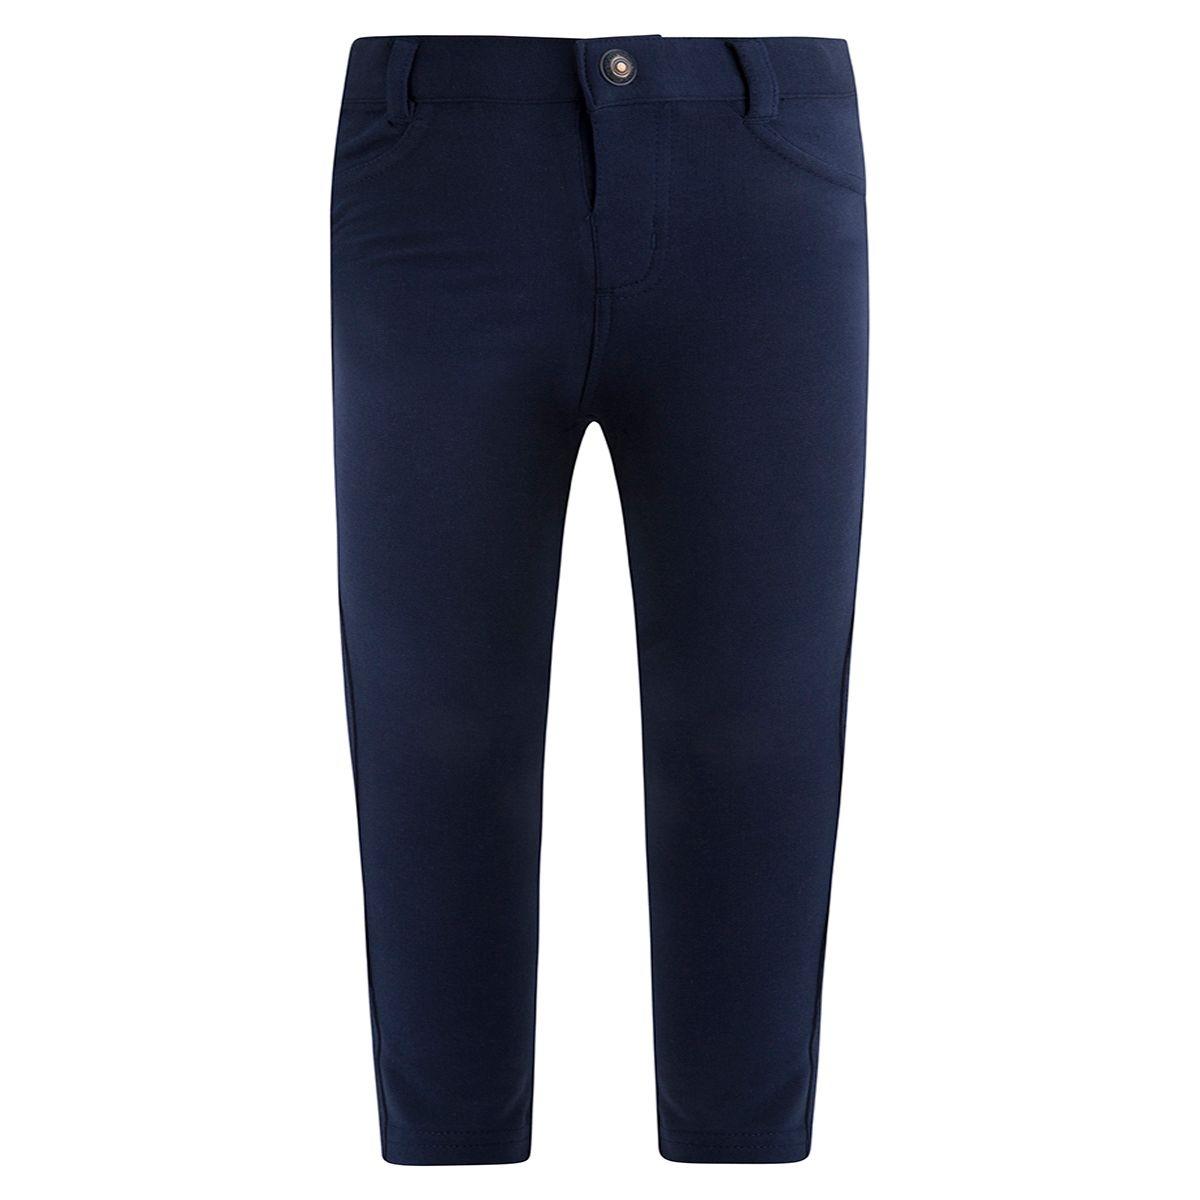 Pantalon bbcupe bébé fille bleu